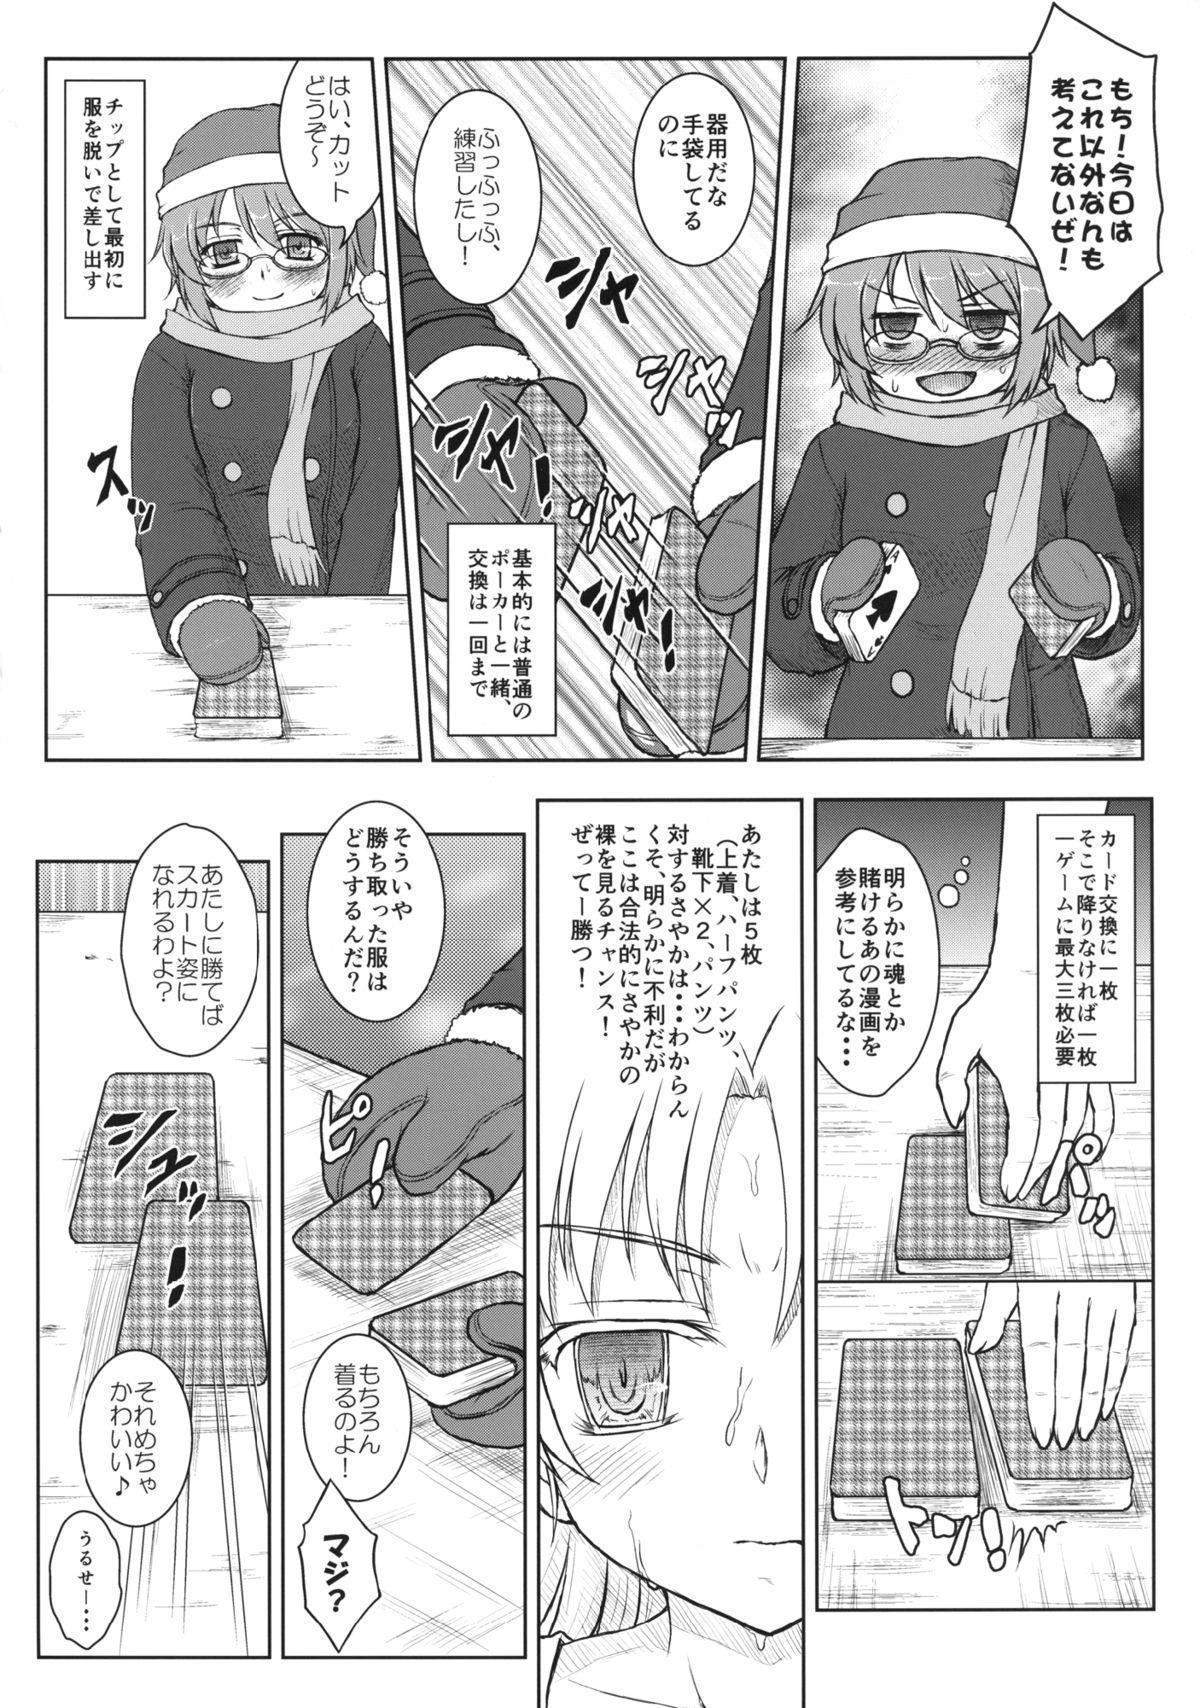 (SHT2013 Haru) [Newtype Kenkyuujo (Kotowari)] Sayaka-san to Kyouko-san (Puella Magi Madoka Magica) 7